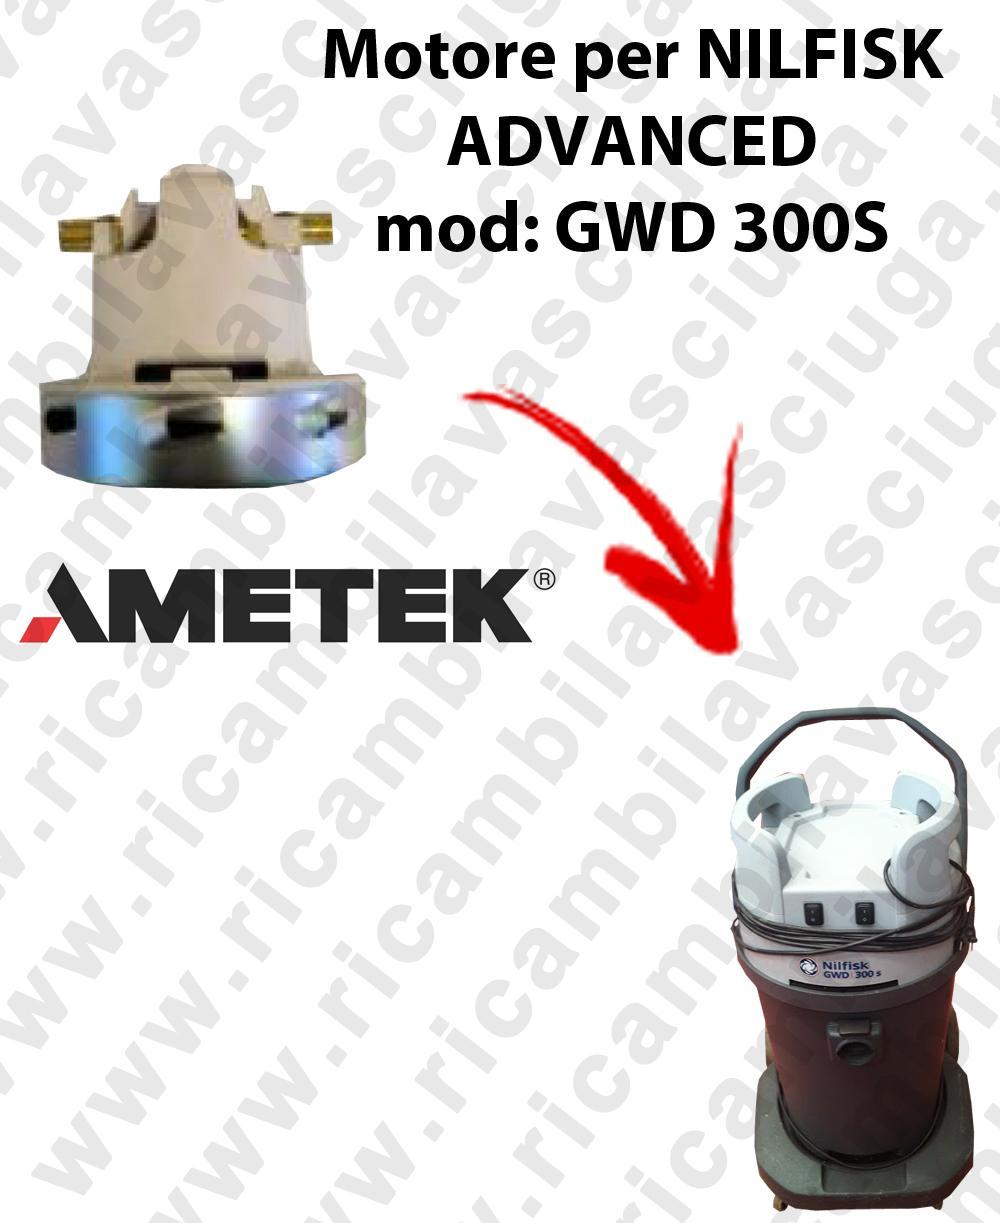 GWD 300 S Motore de aspiración AMETEK para aspiradora NILFISK ADVANCE